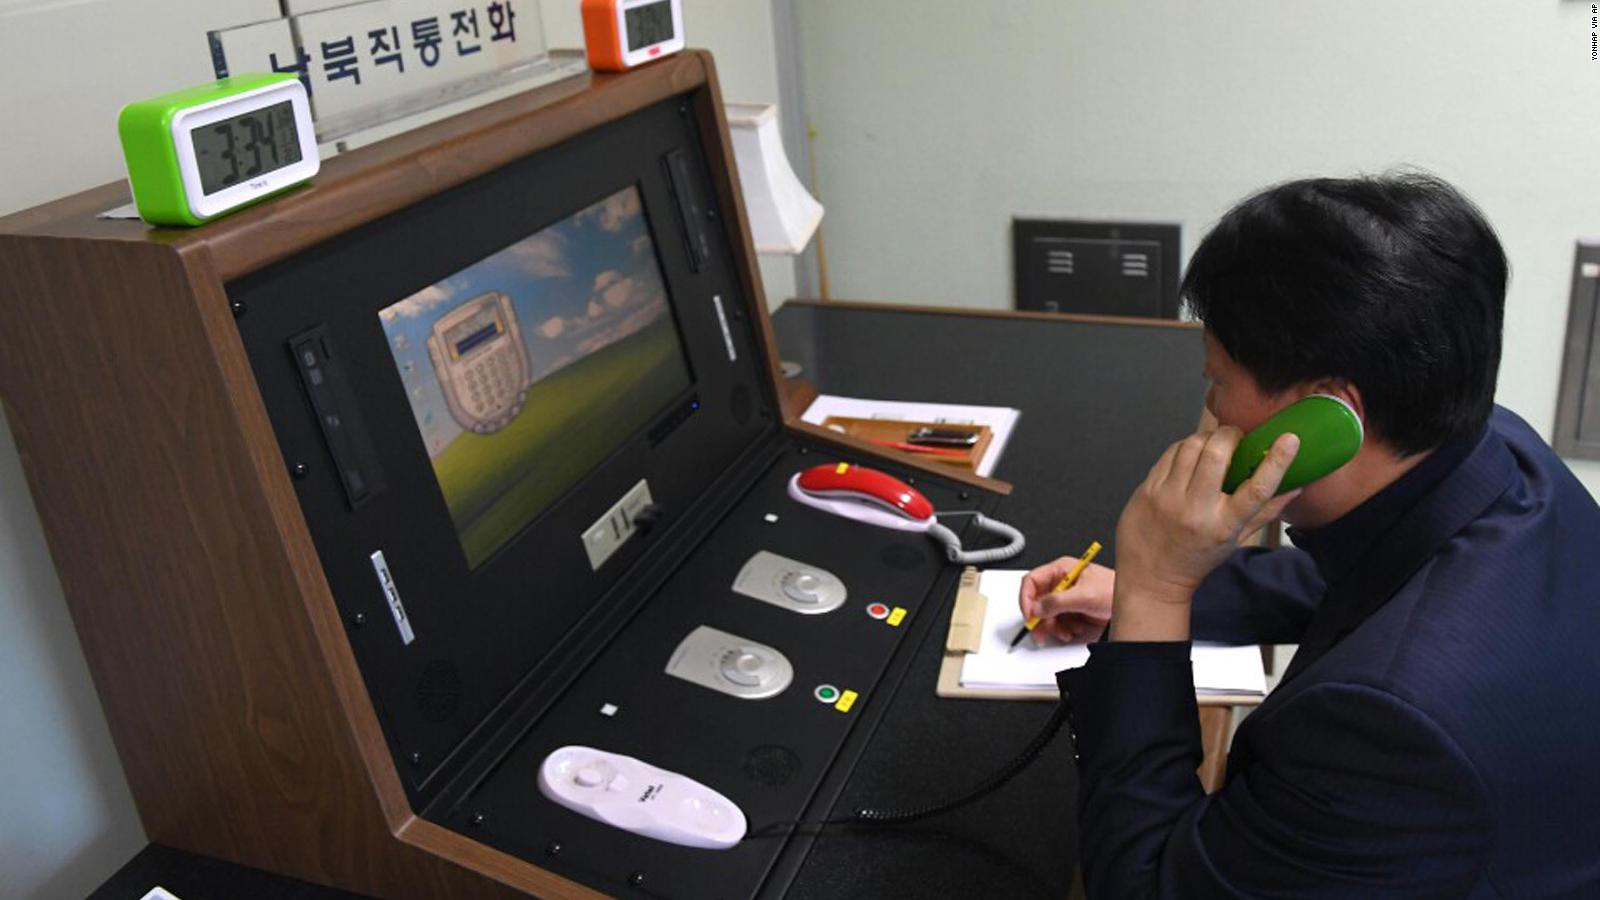 180103110100-02-north-korea-south-korea-